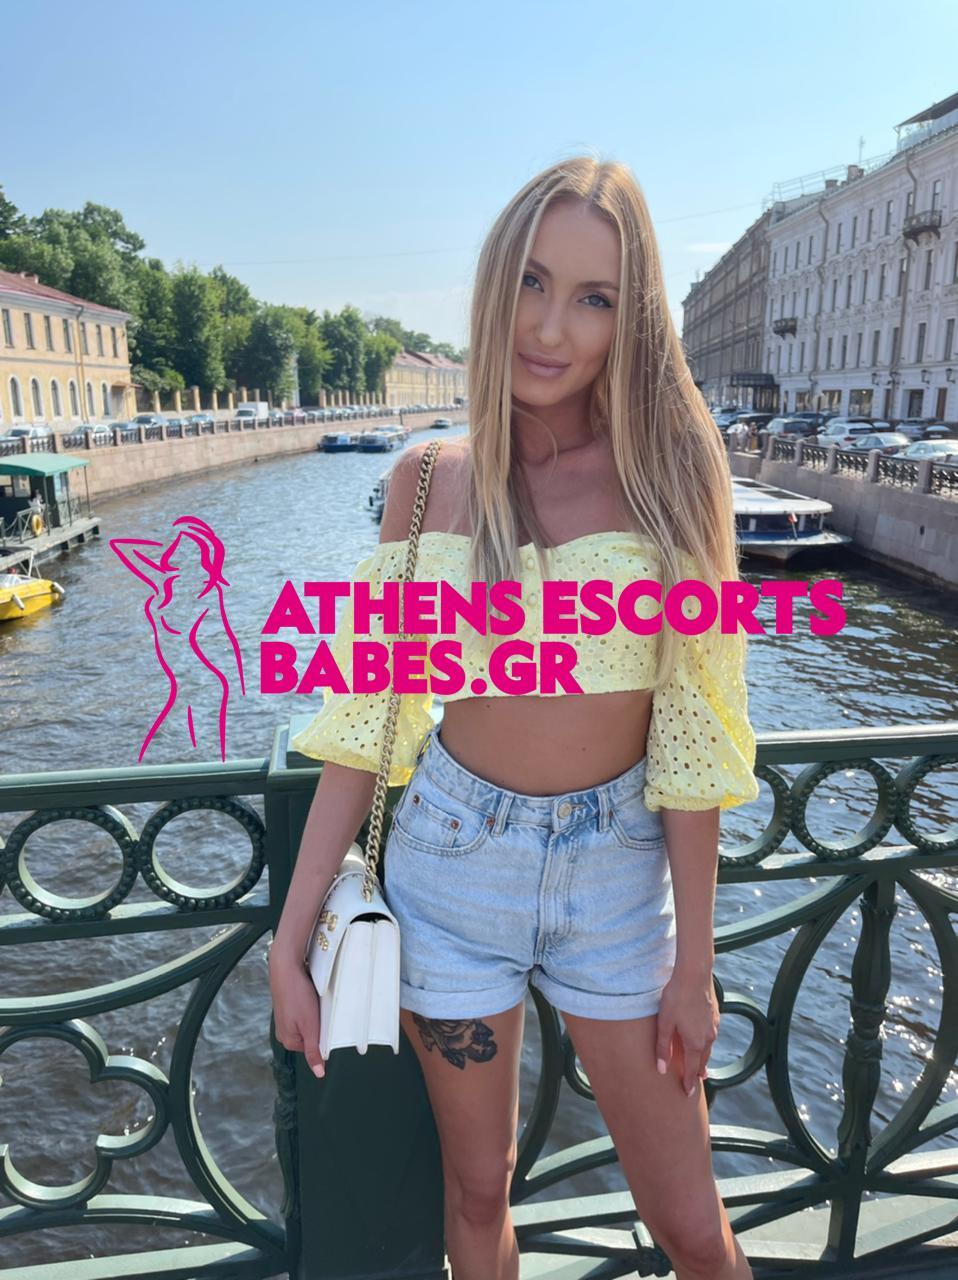 ARIELA HOT SEXY ESCORT ATHENS